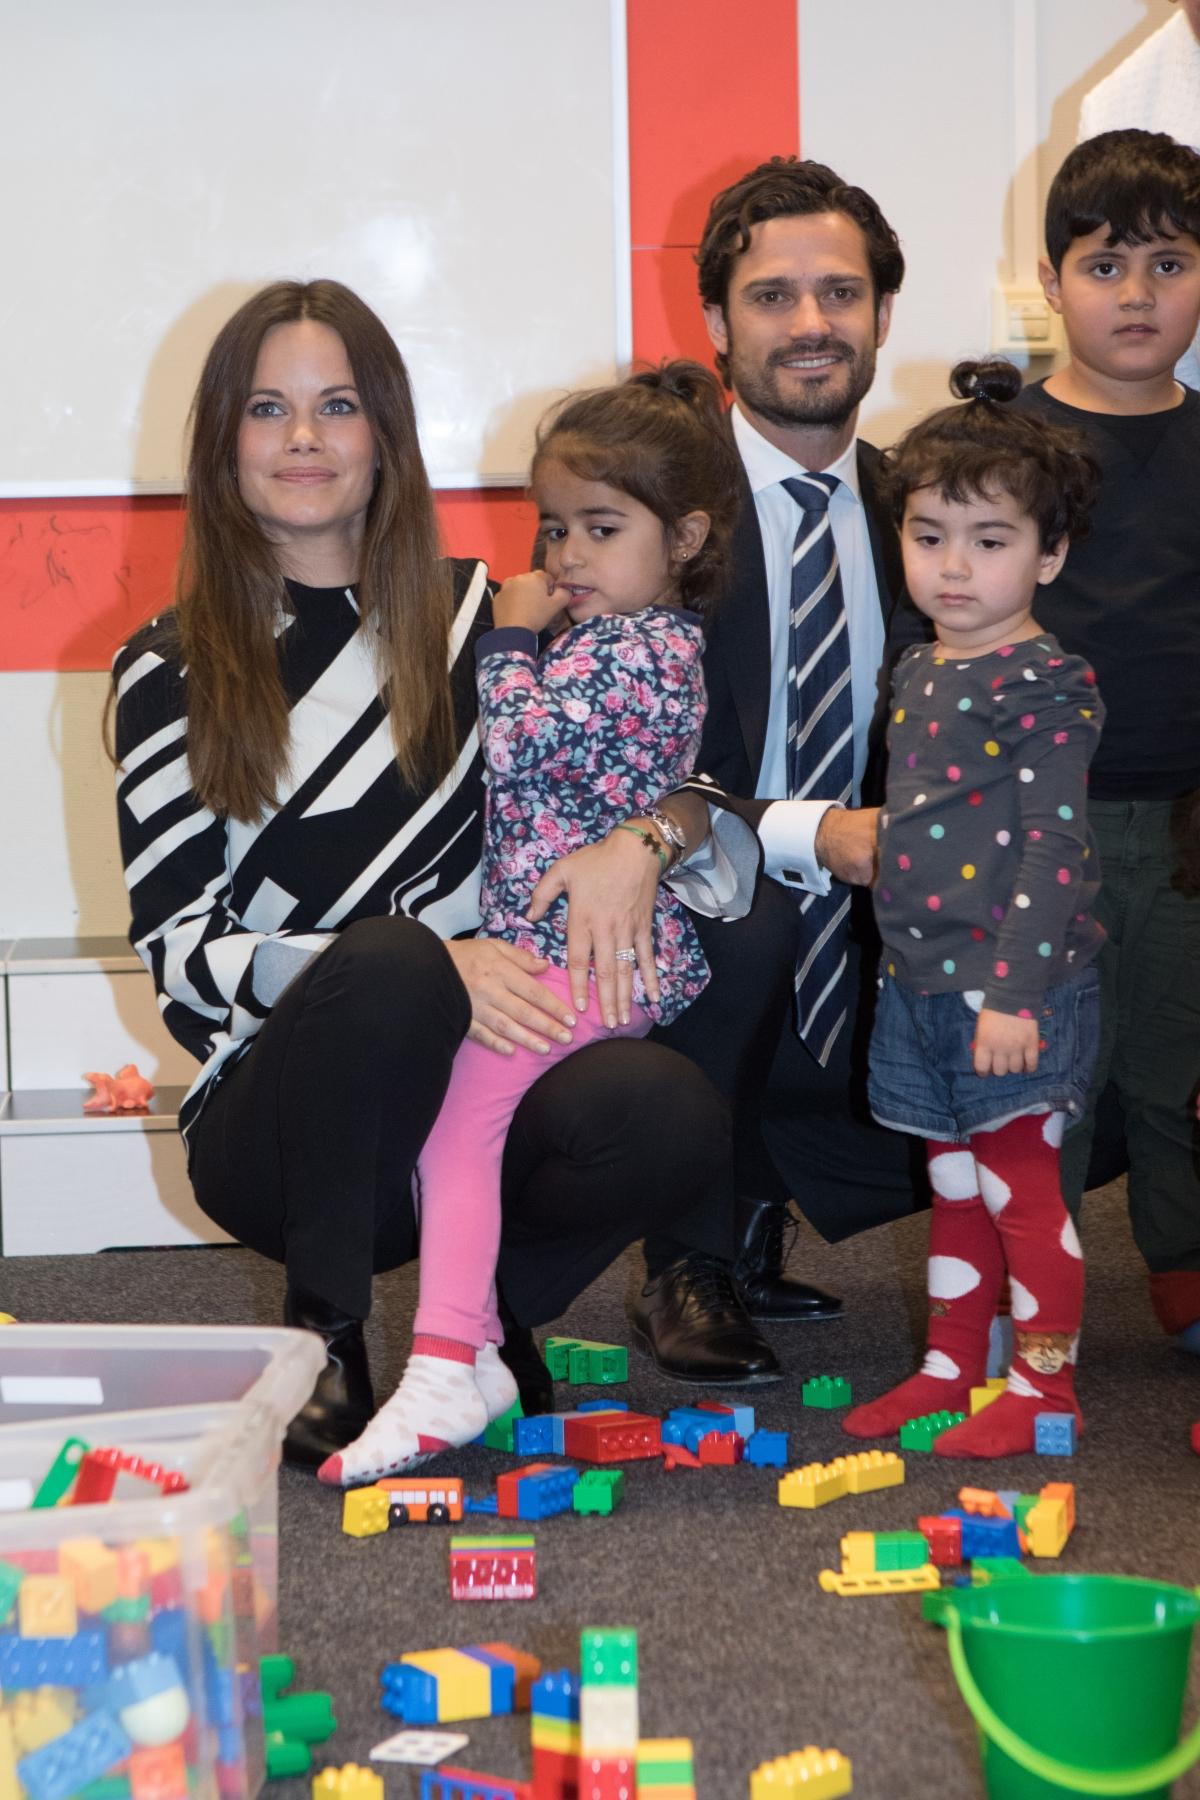 Princess Sofia and Prince Carl